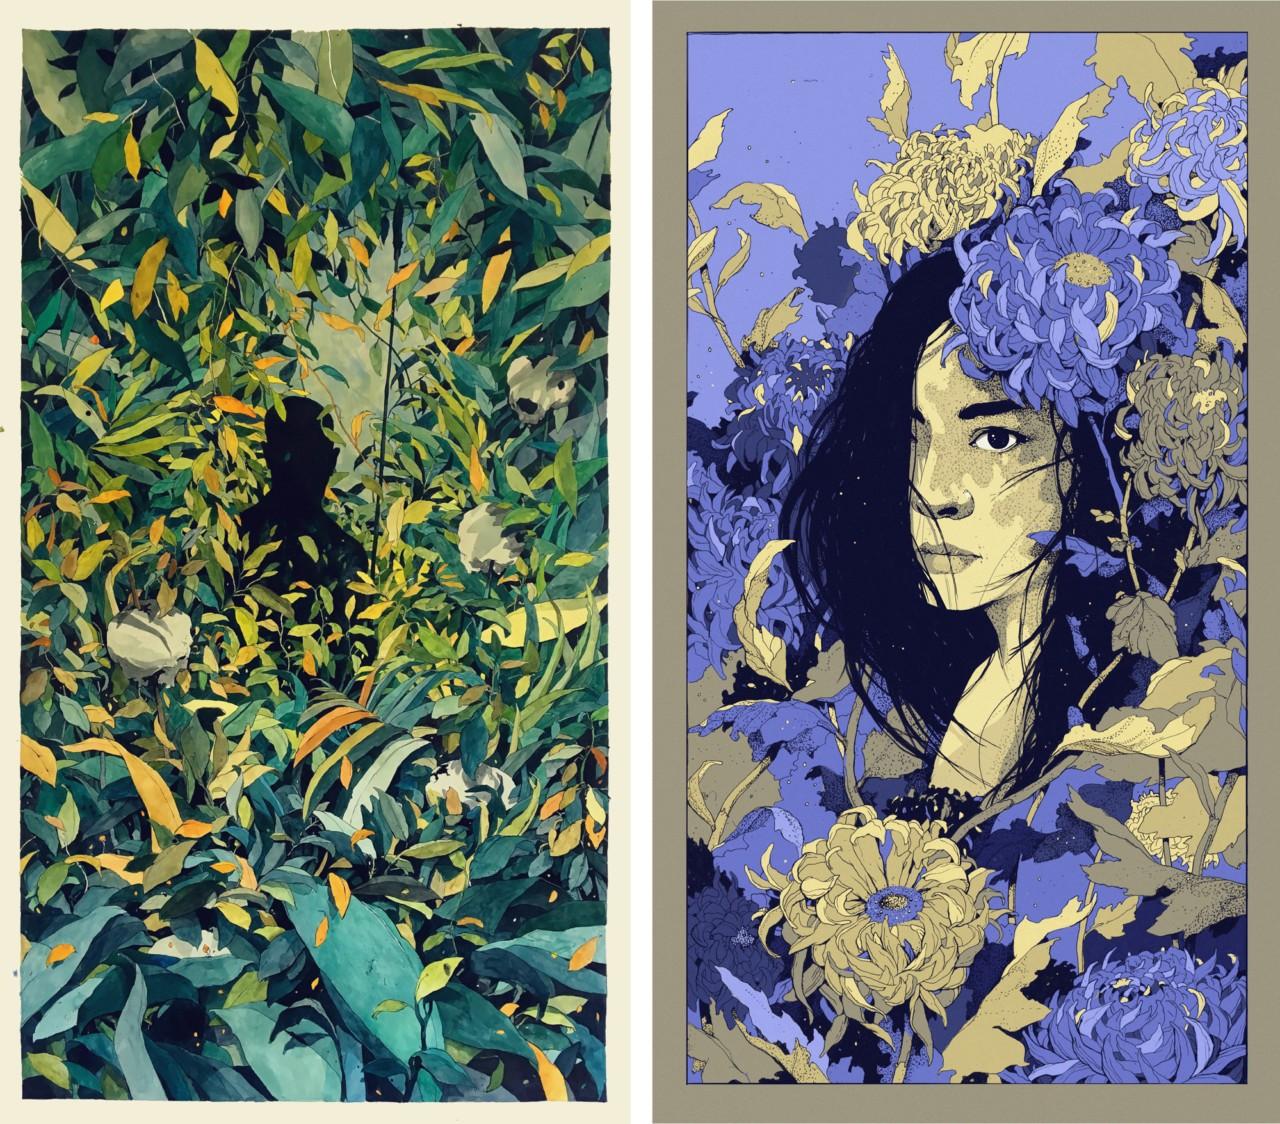 Illustrations by Simon Prades